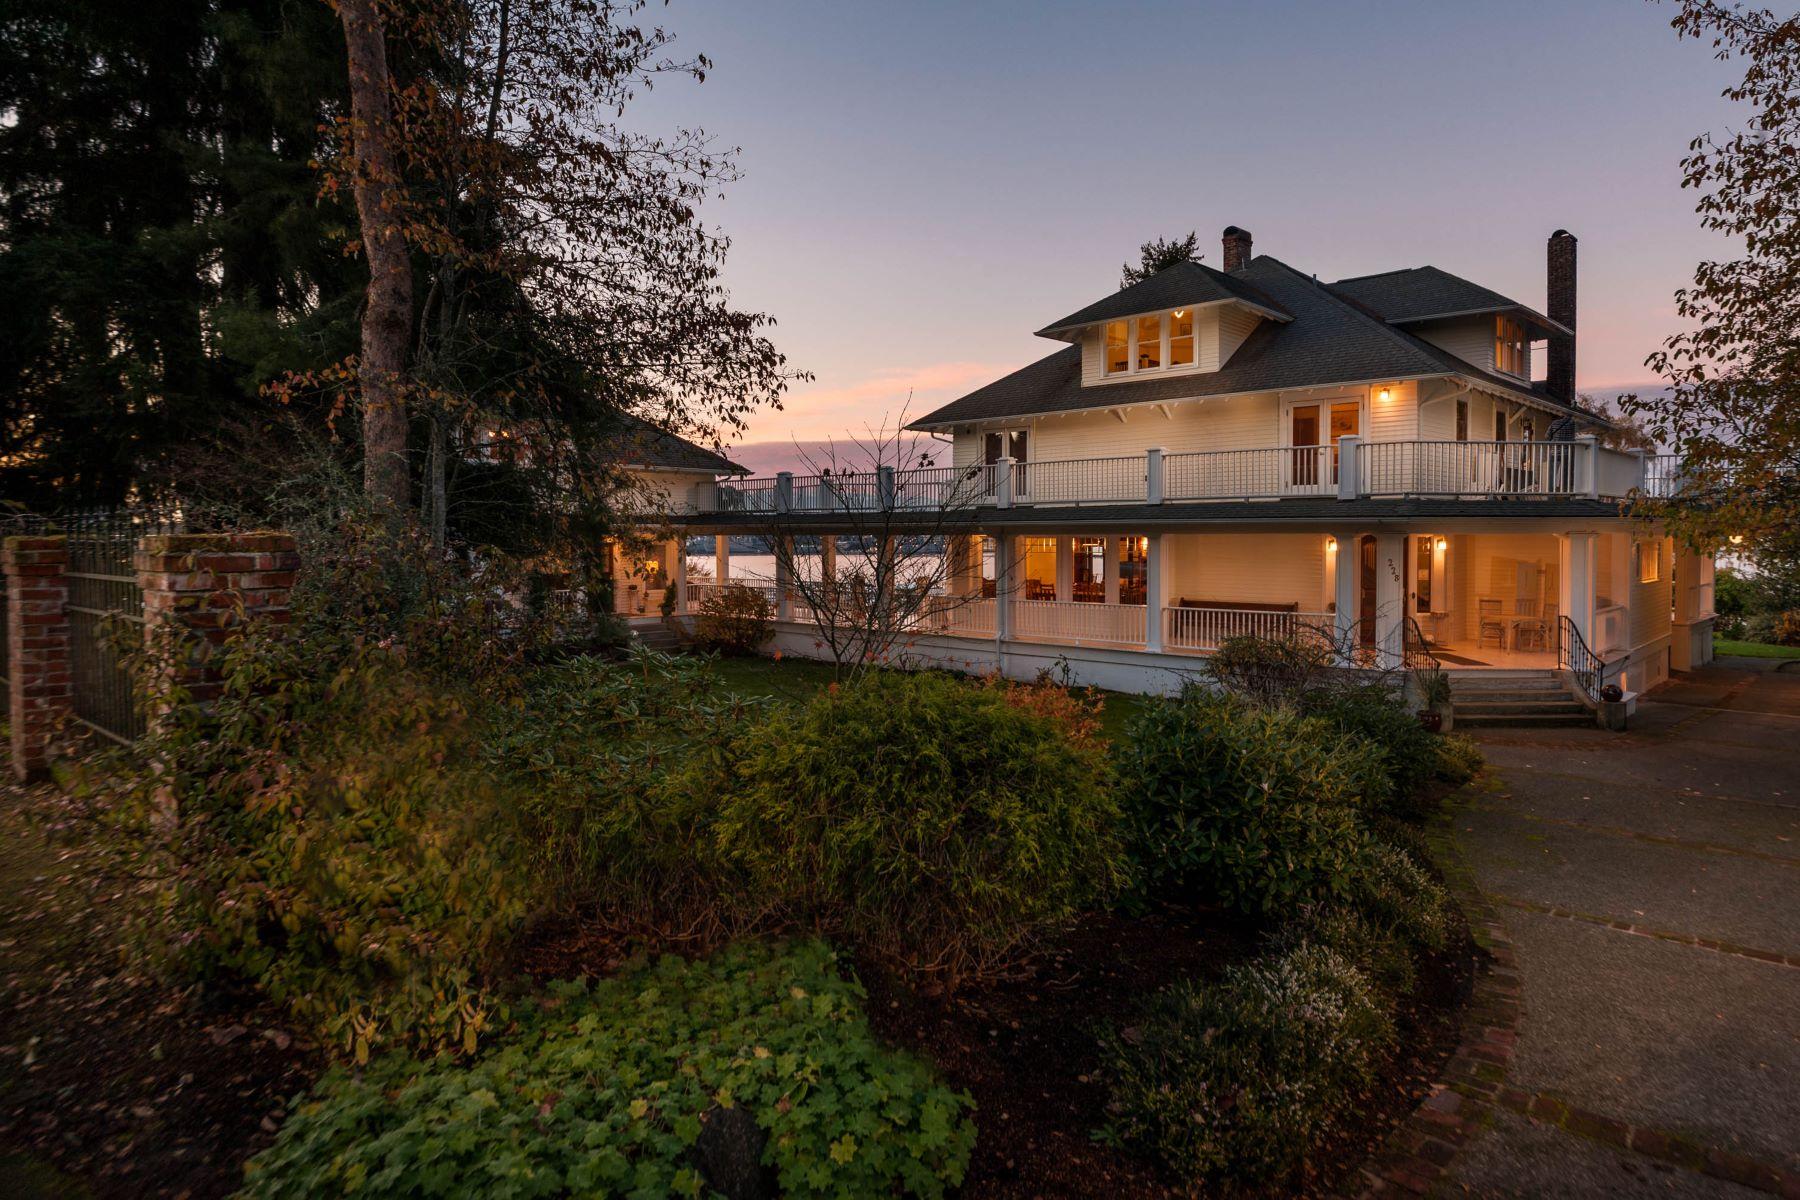 独户住宅 为 销售 在 Lavishly Restored Port Orchard Home 228 Seattle Ave 奥查德港, 华盛顿州, 98366 美国